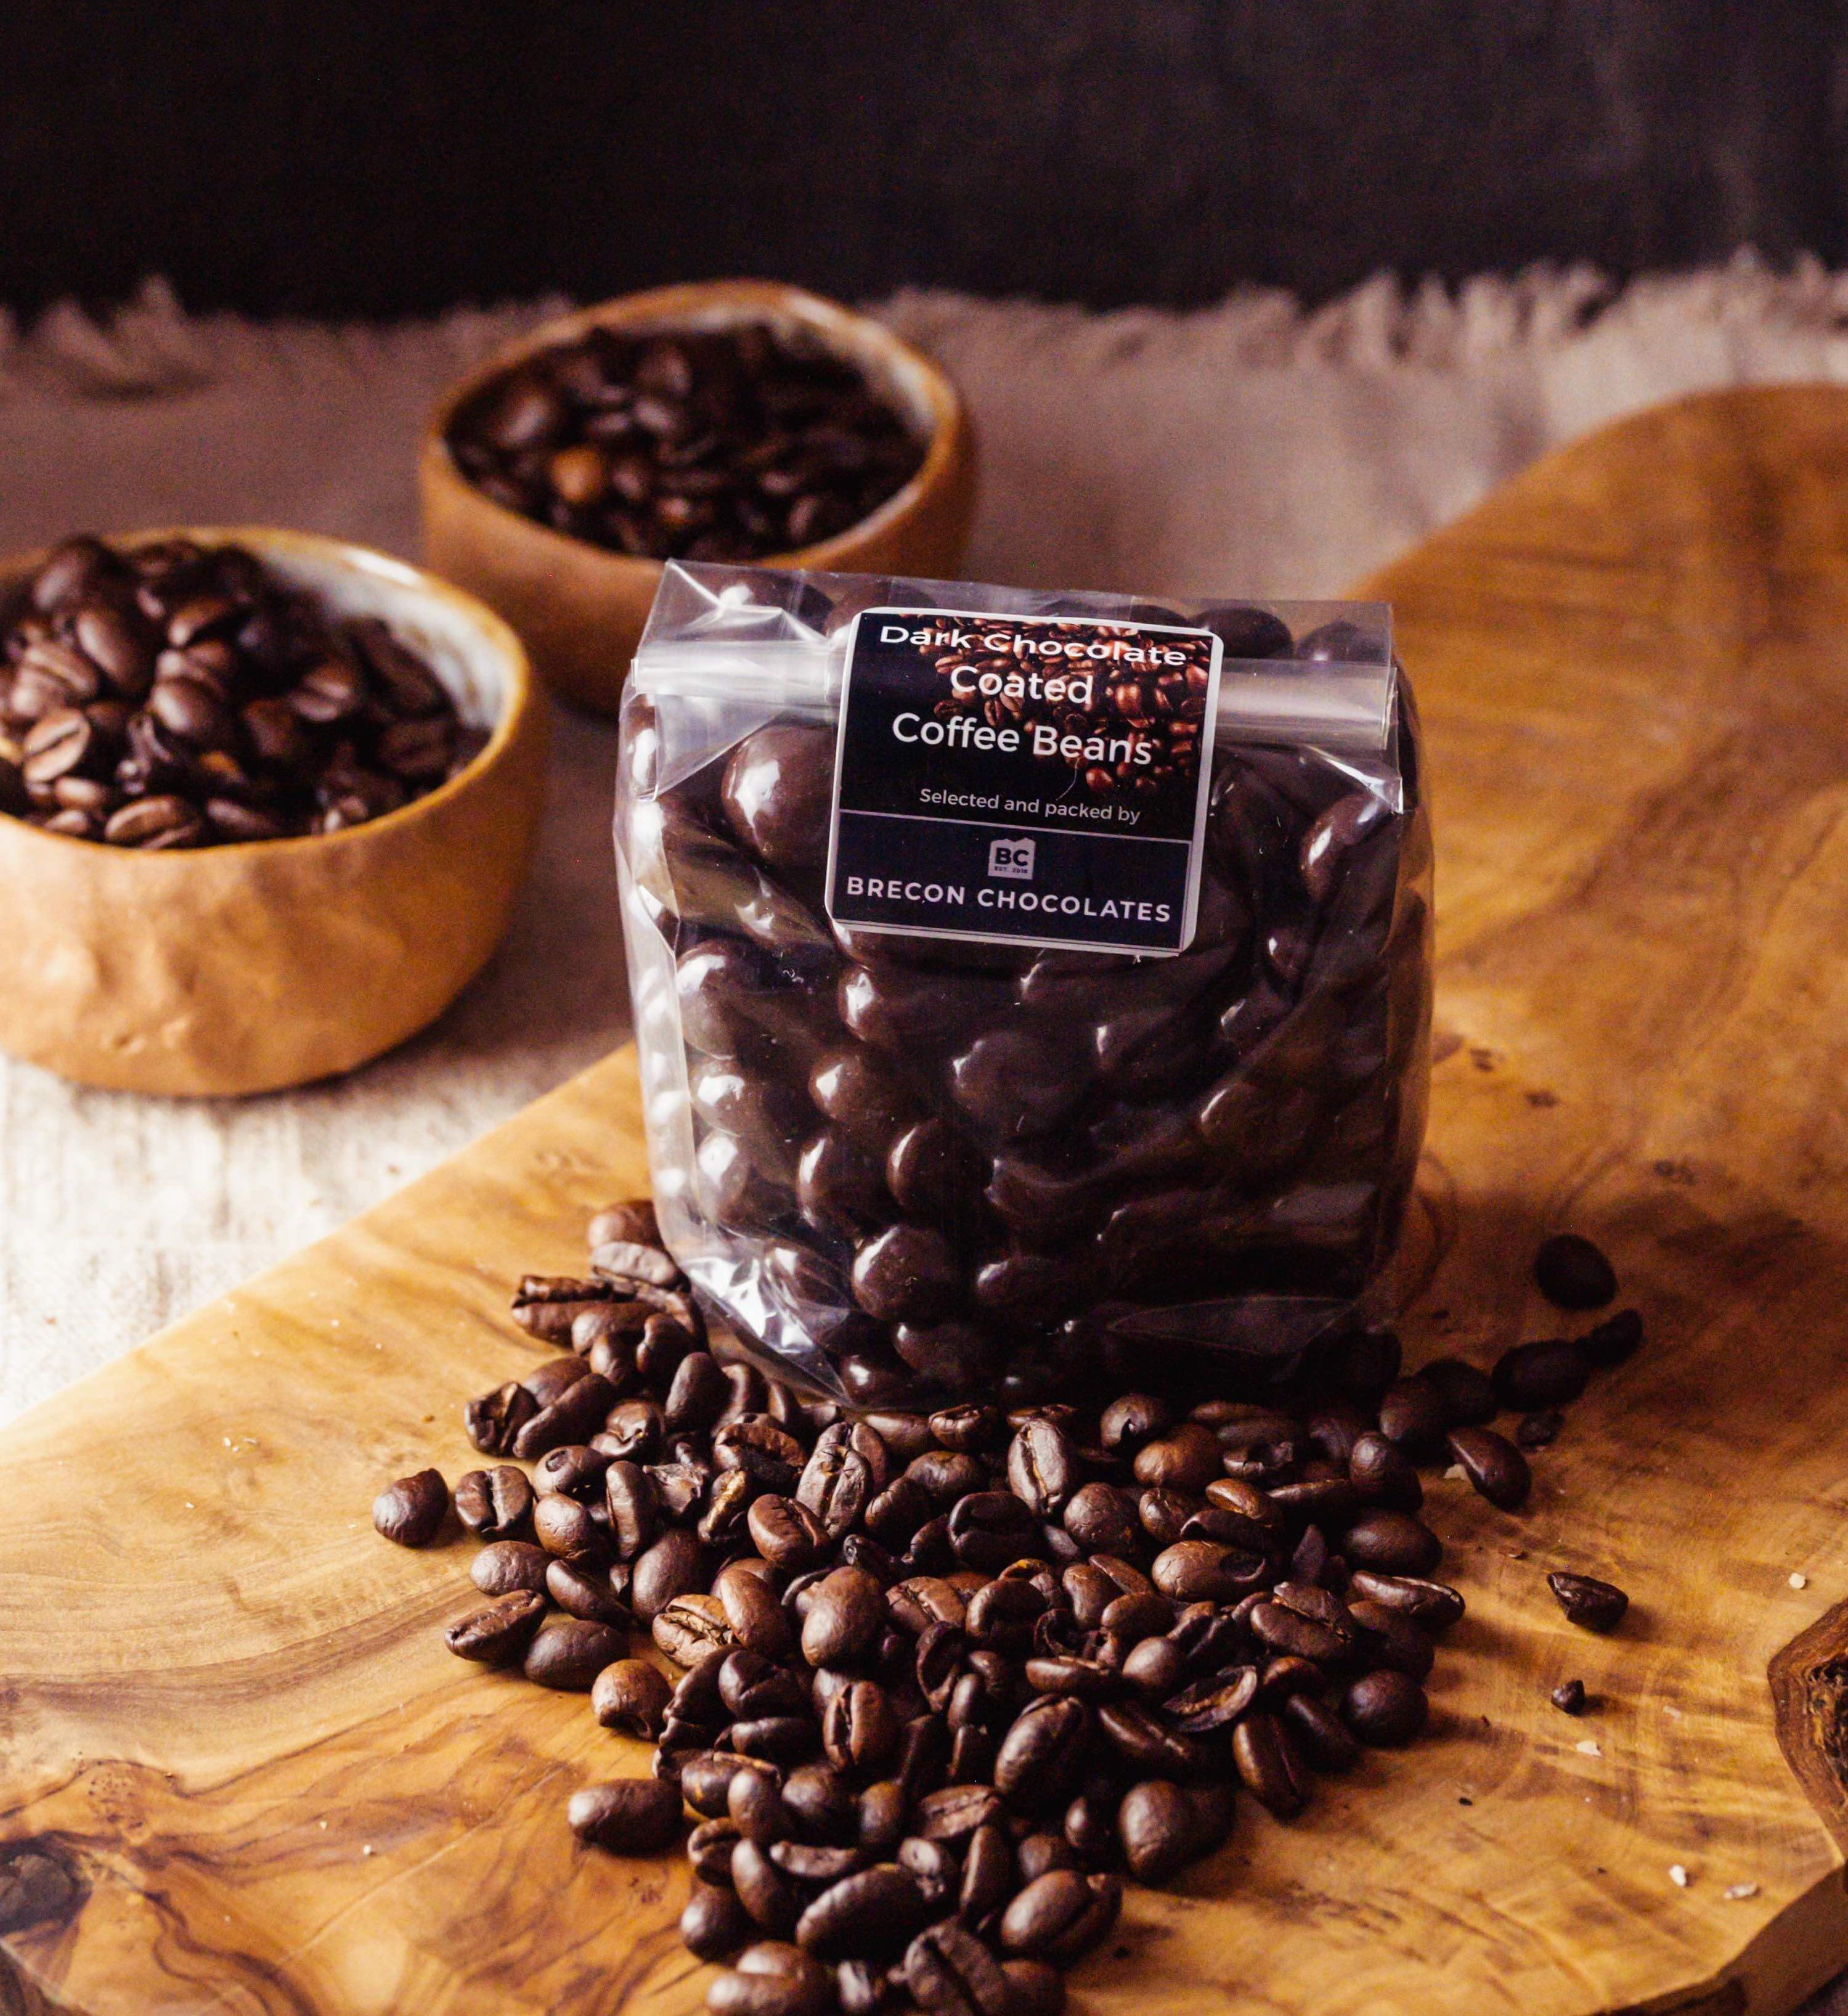 Dark Chocolate coated coffee beans